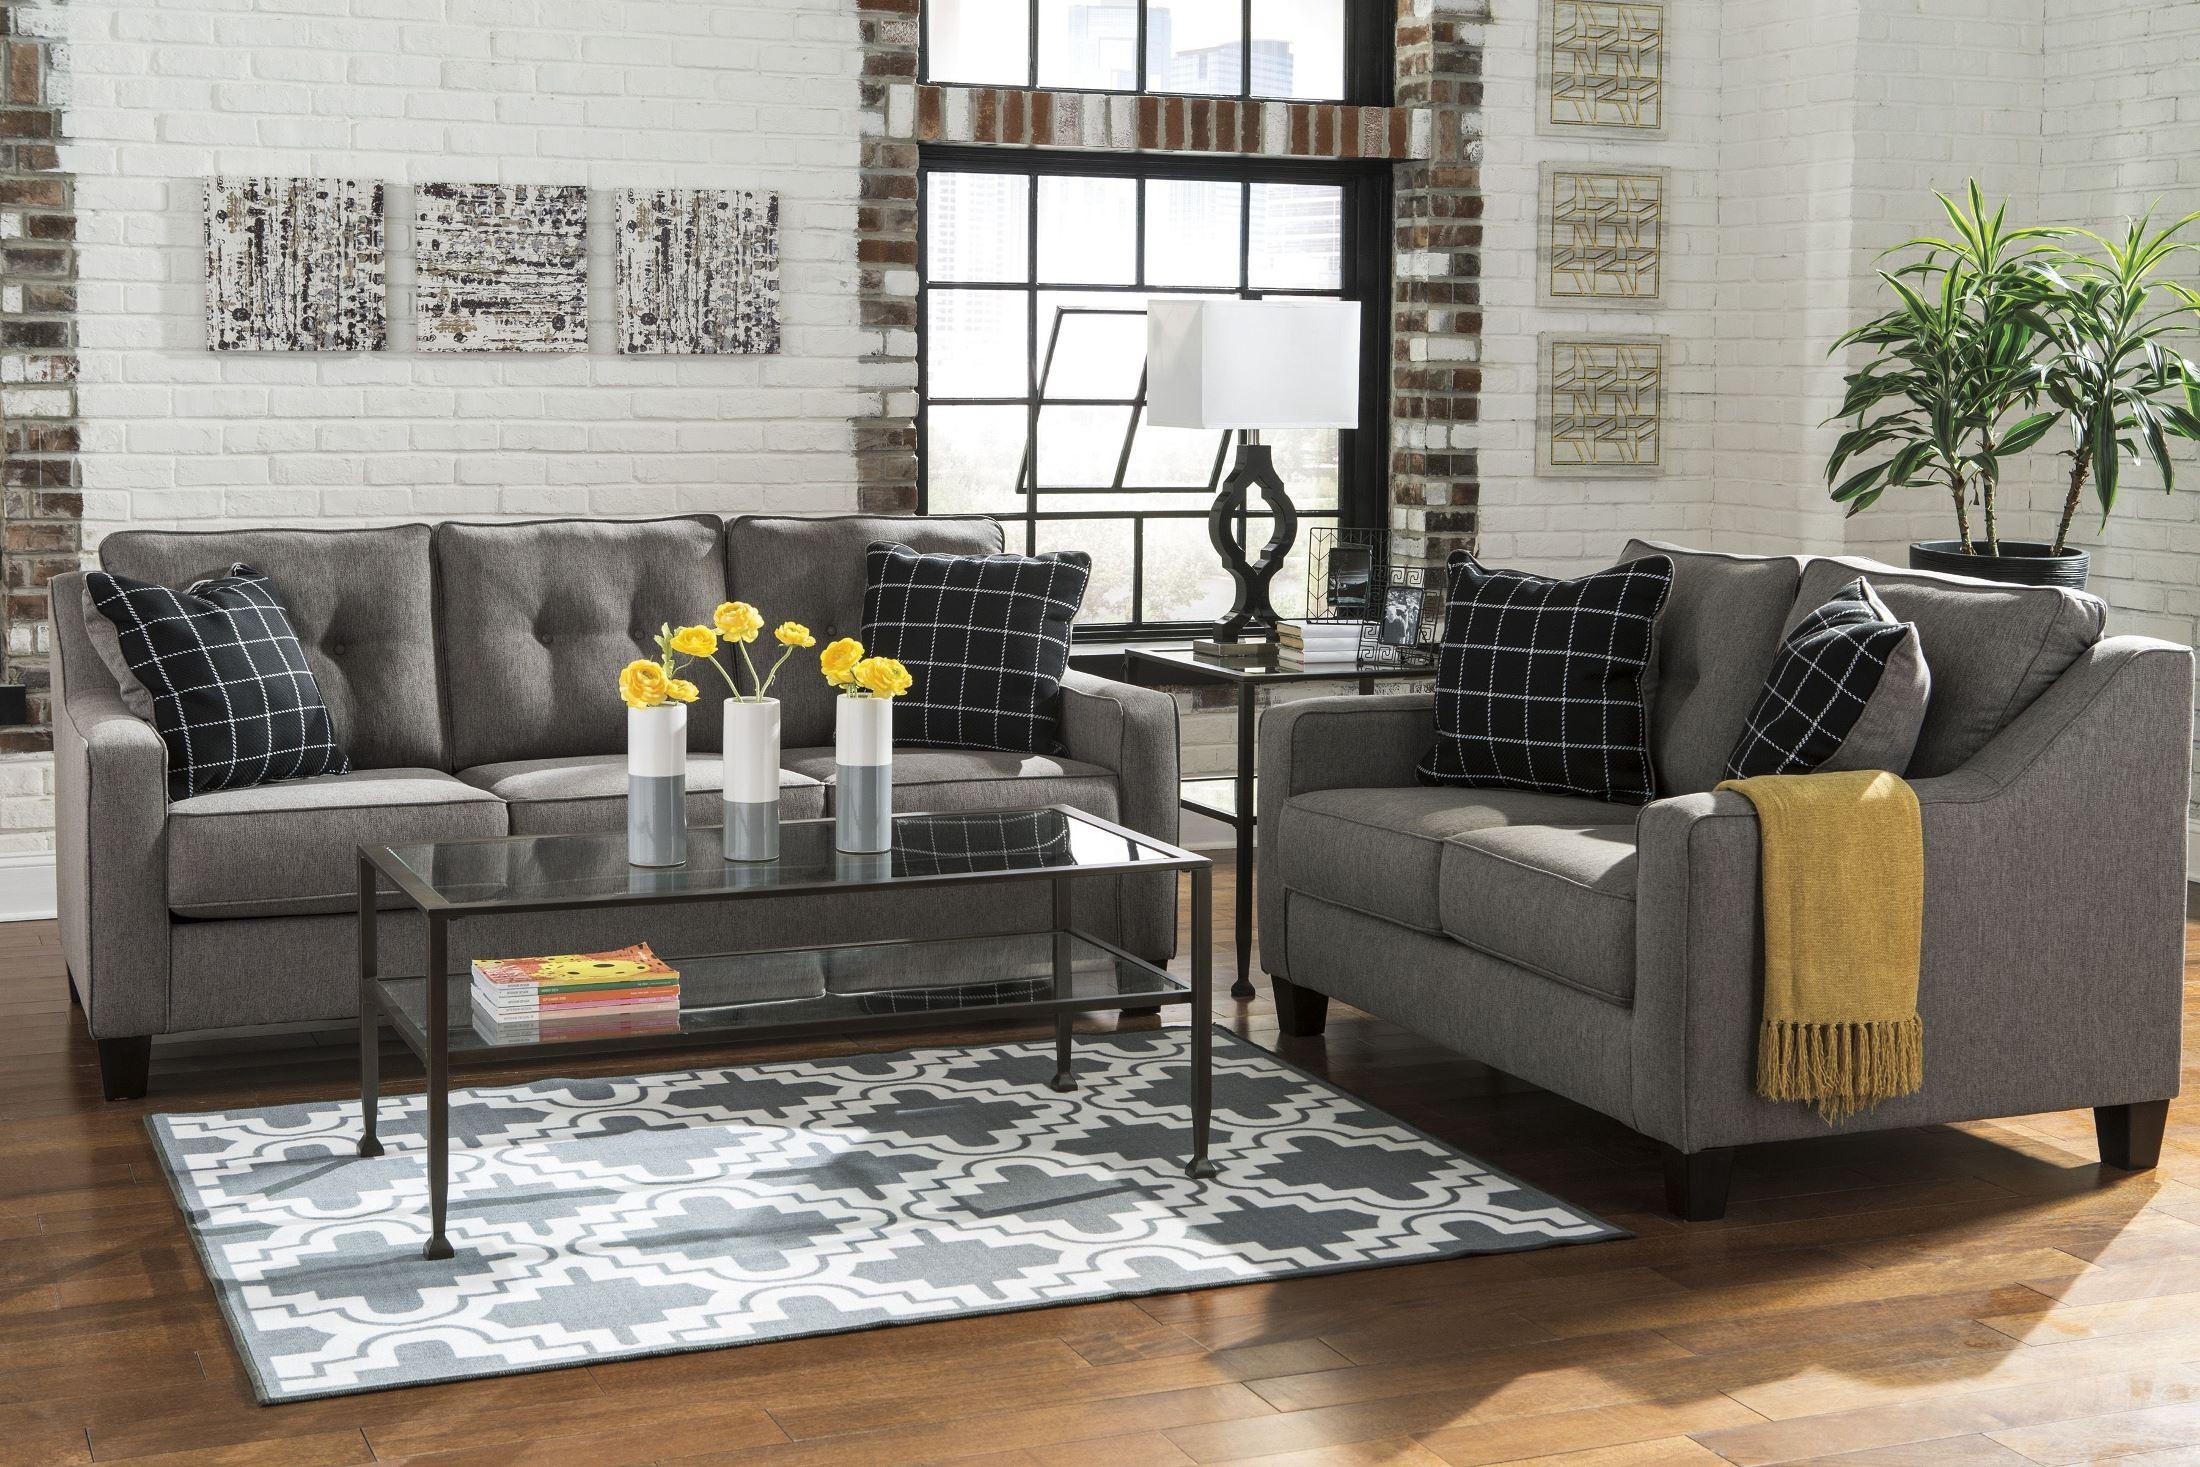 Brindon Charcoal Sofa from Ashley